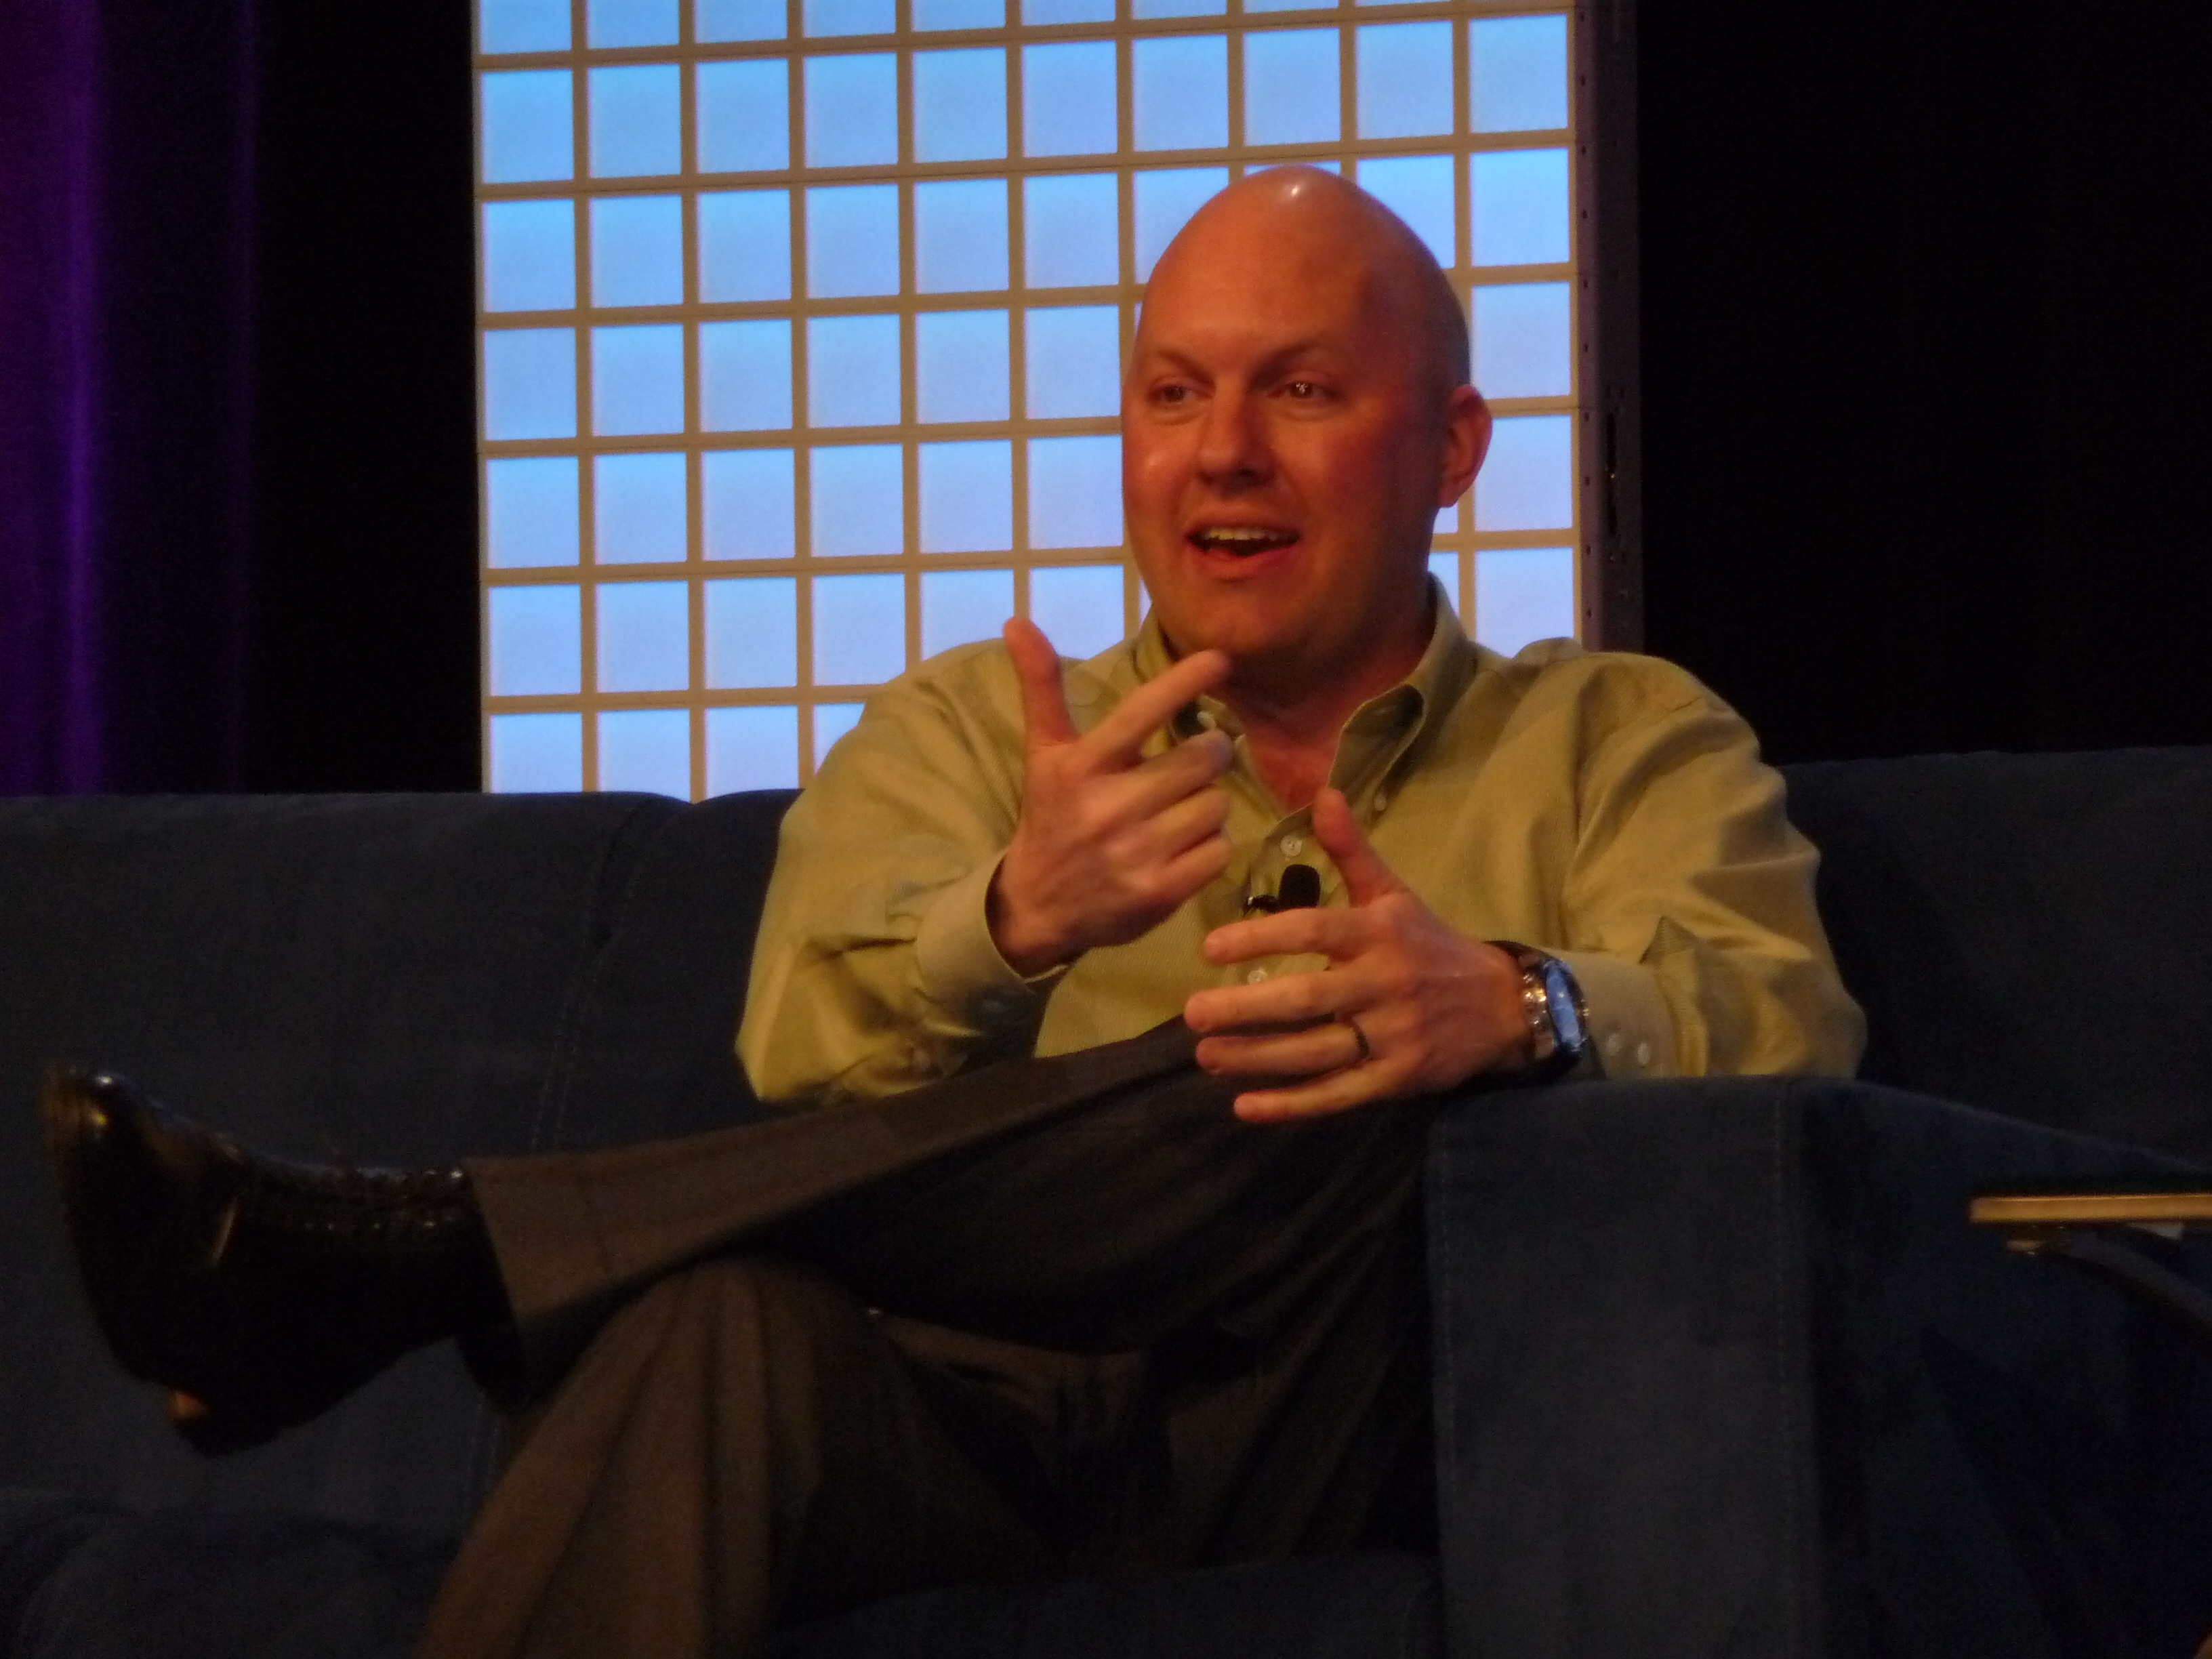 Marc Andreessen's quote #2